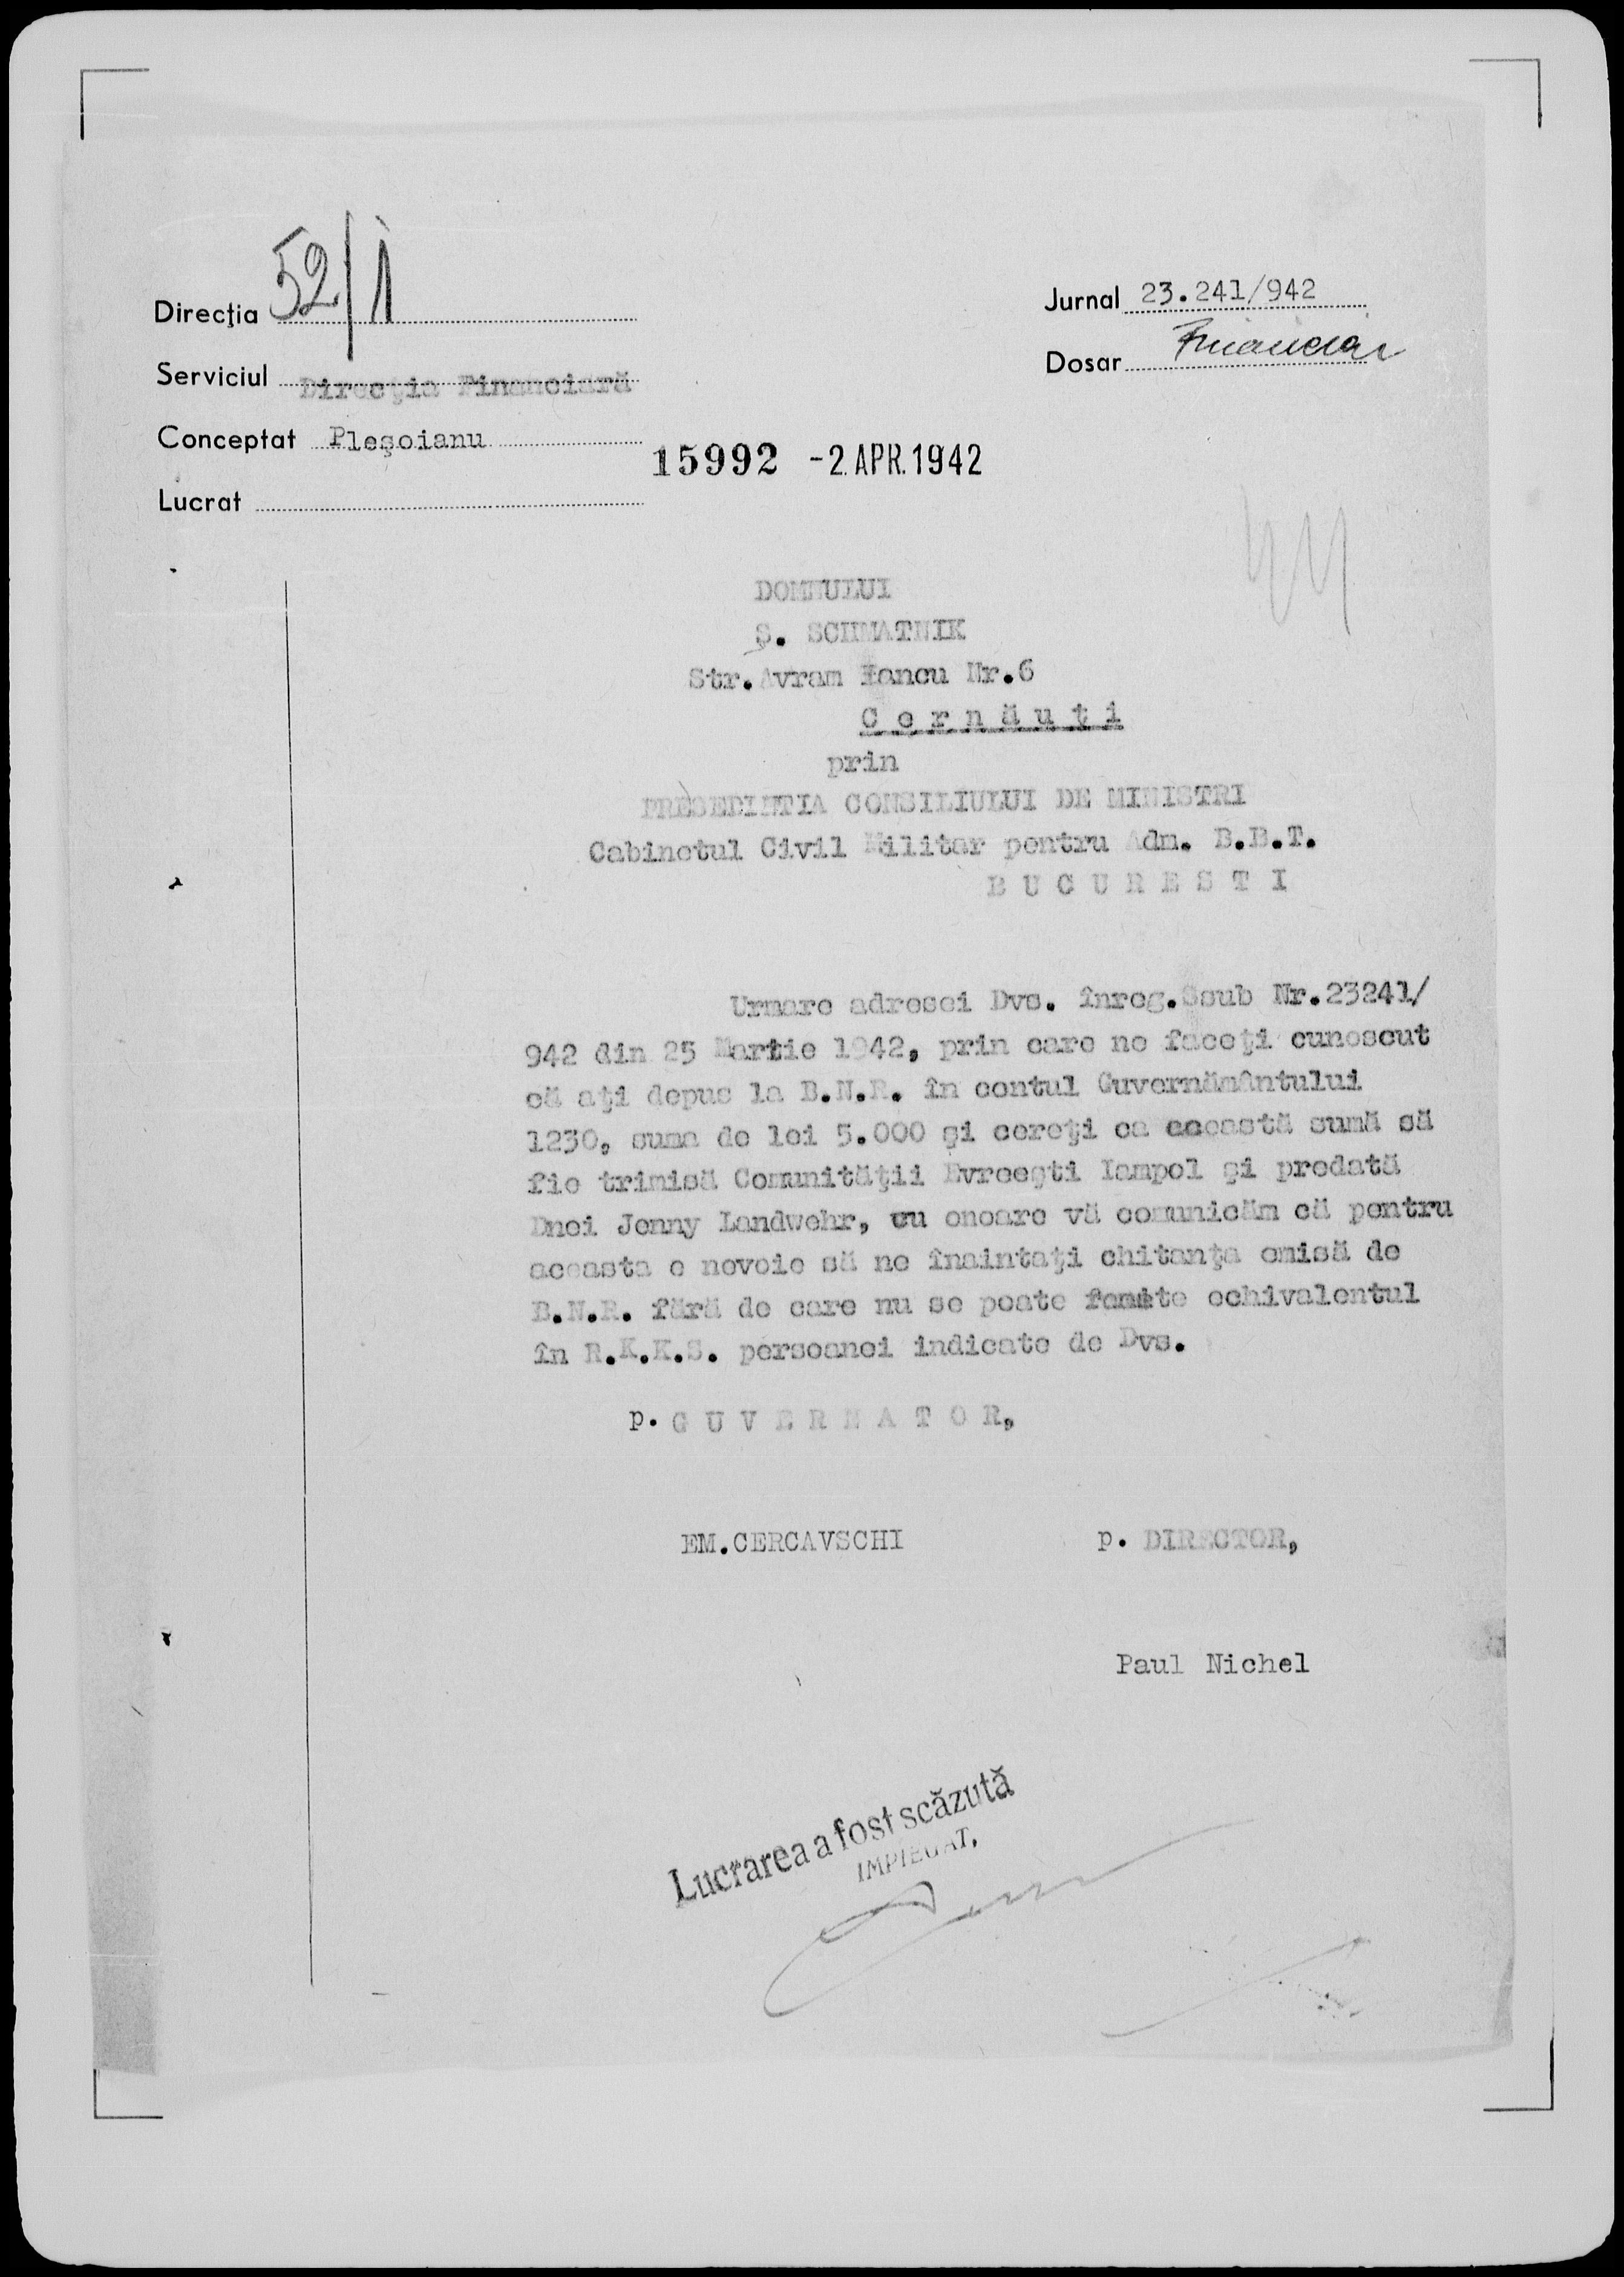 Sigmund-Schmatnik-document-2April1942